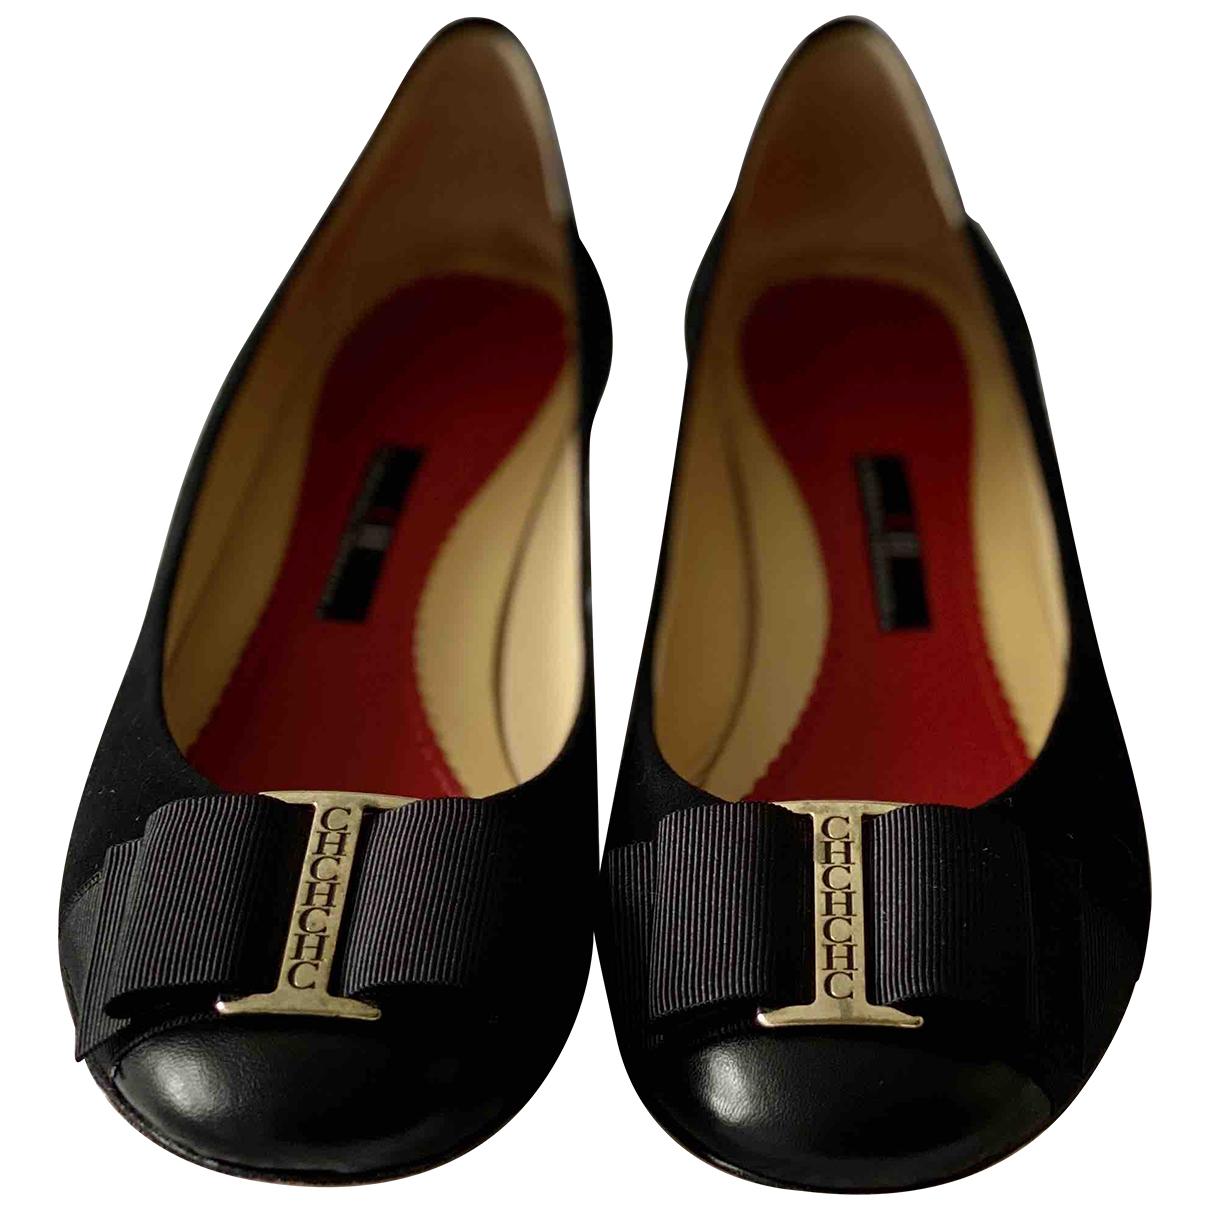 Carolina Herrera N Black Leather Ballet flats for Women 37 EU